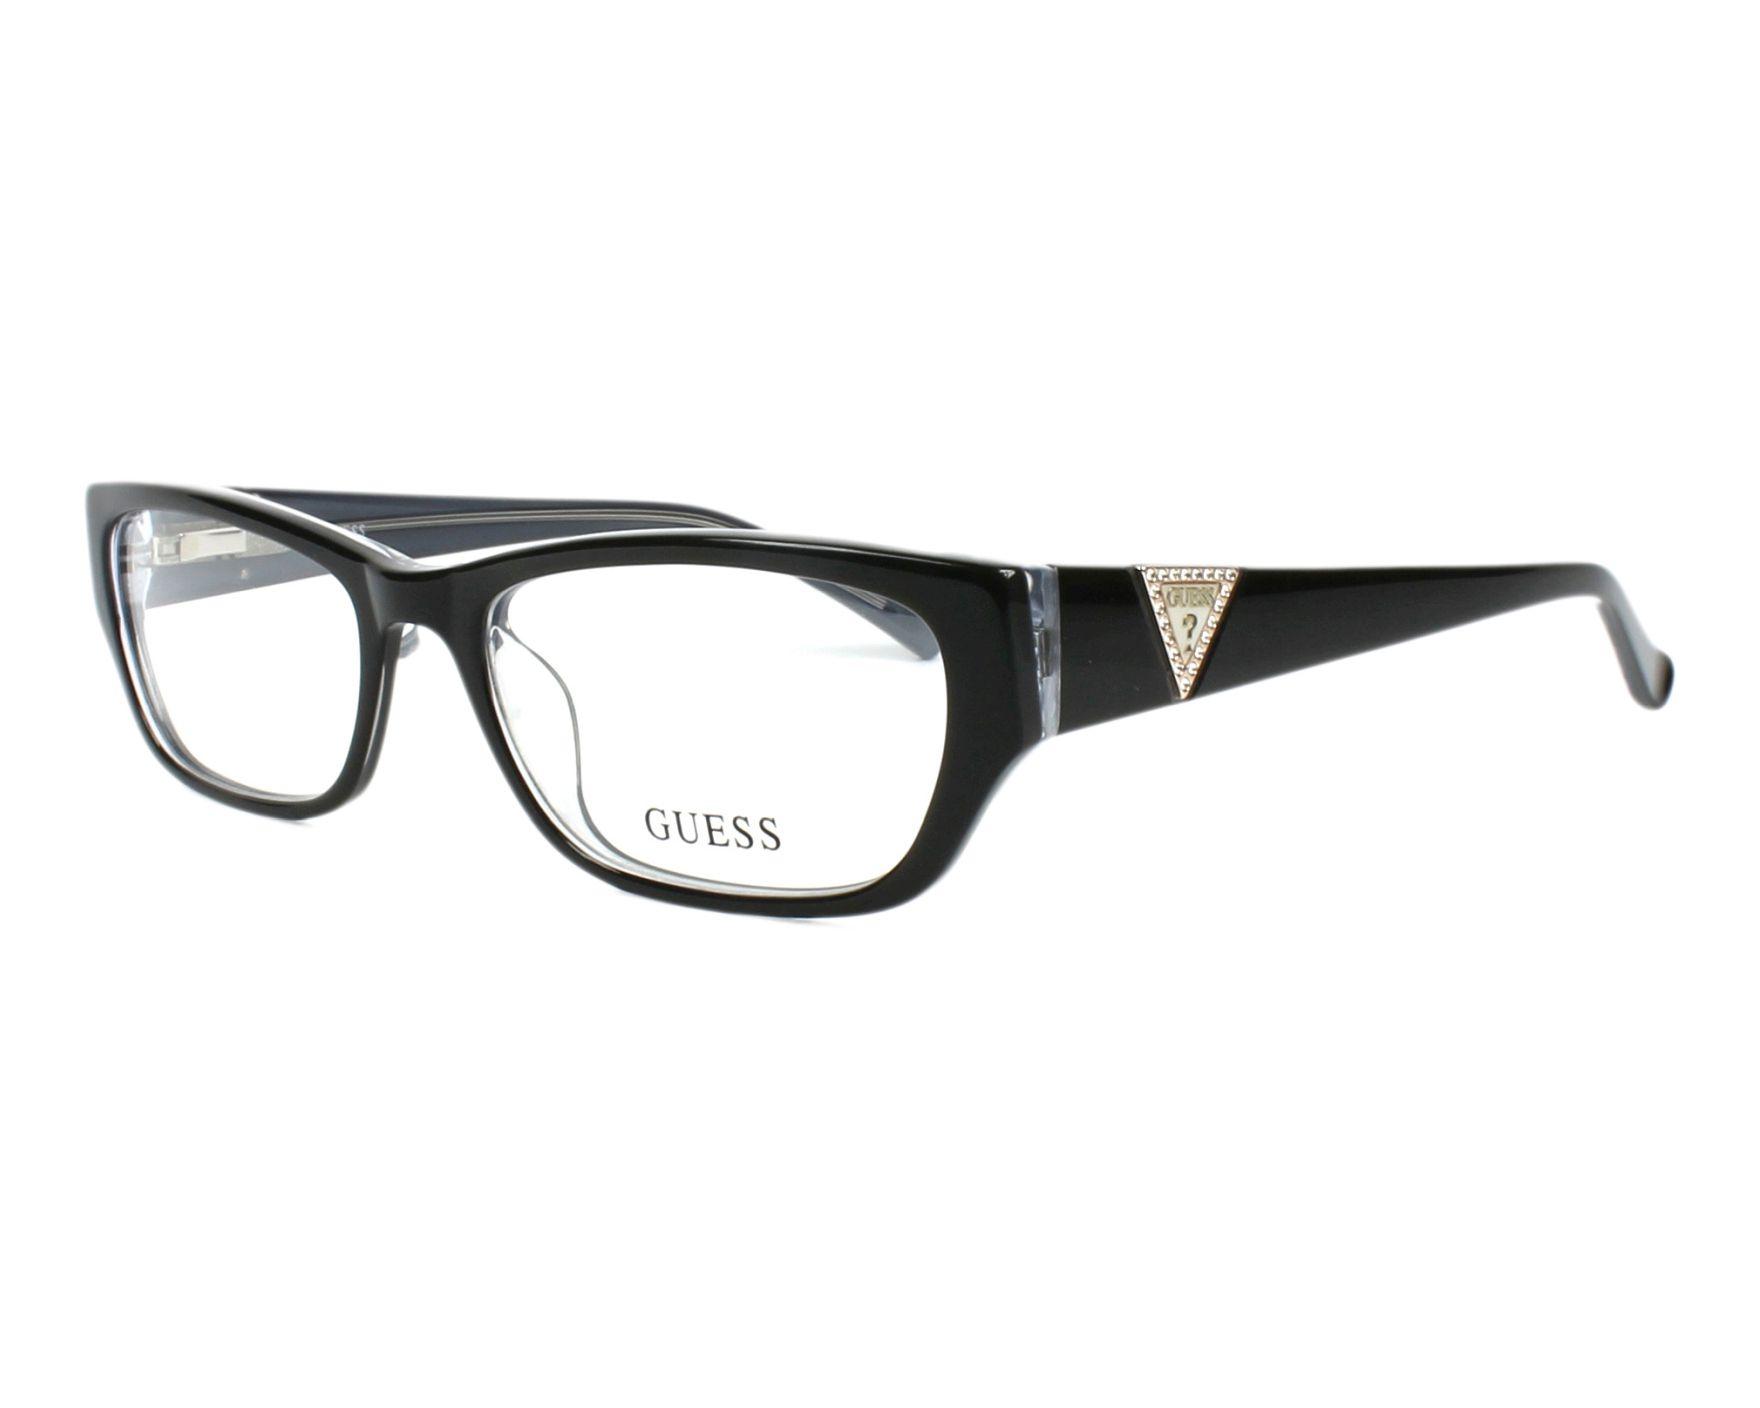 eyeglasses Guess GU-2387 BLK 54-17 Black Crystal profile view